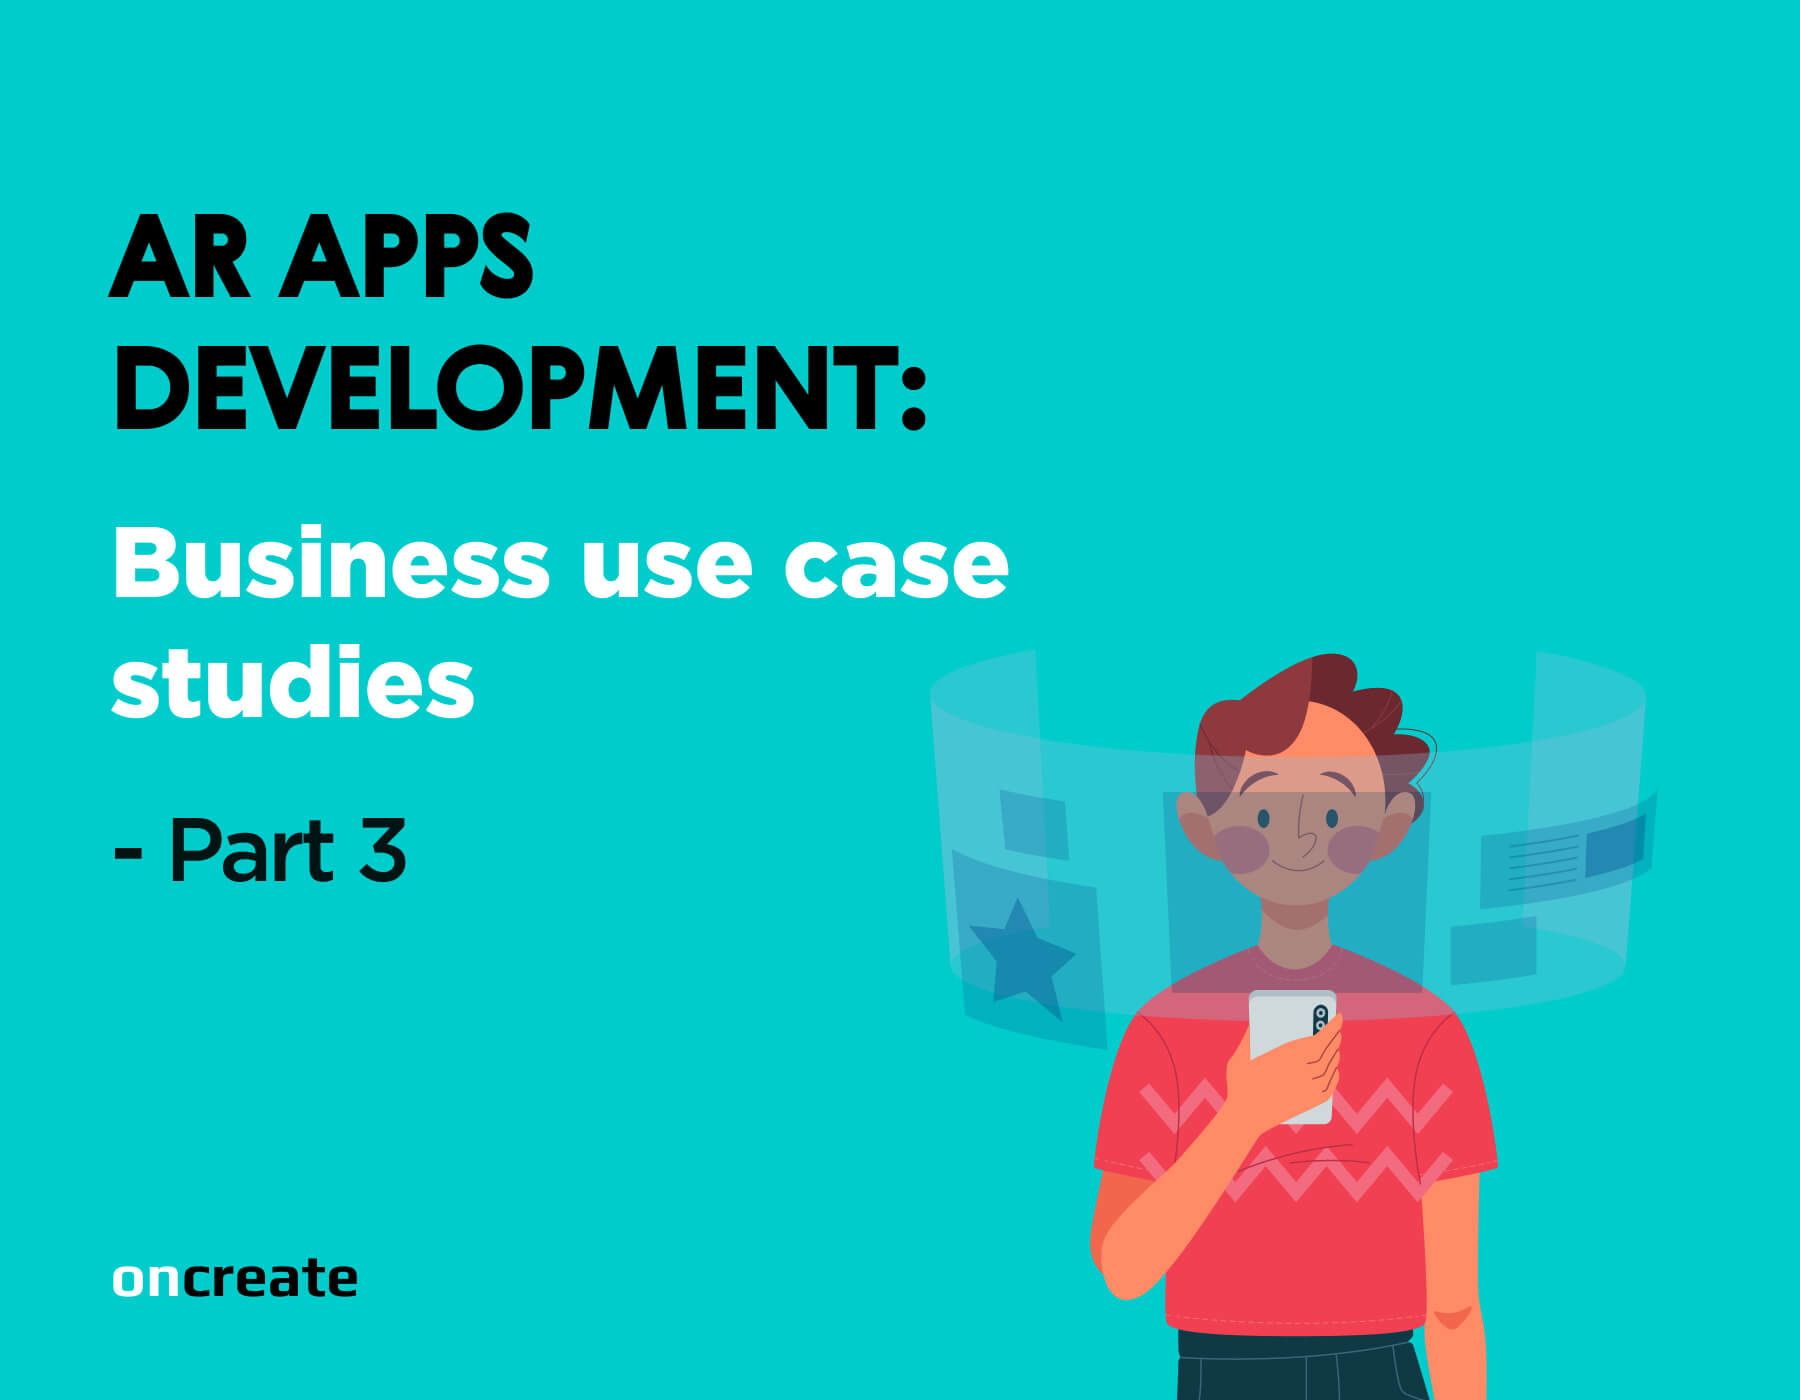 AR Apps Development. Business use case studies